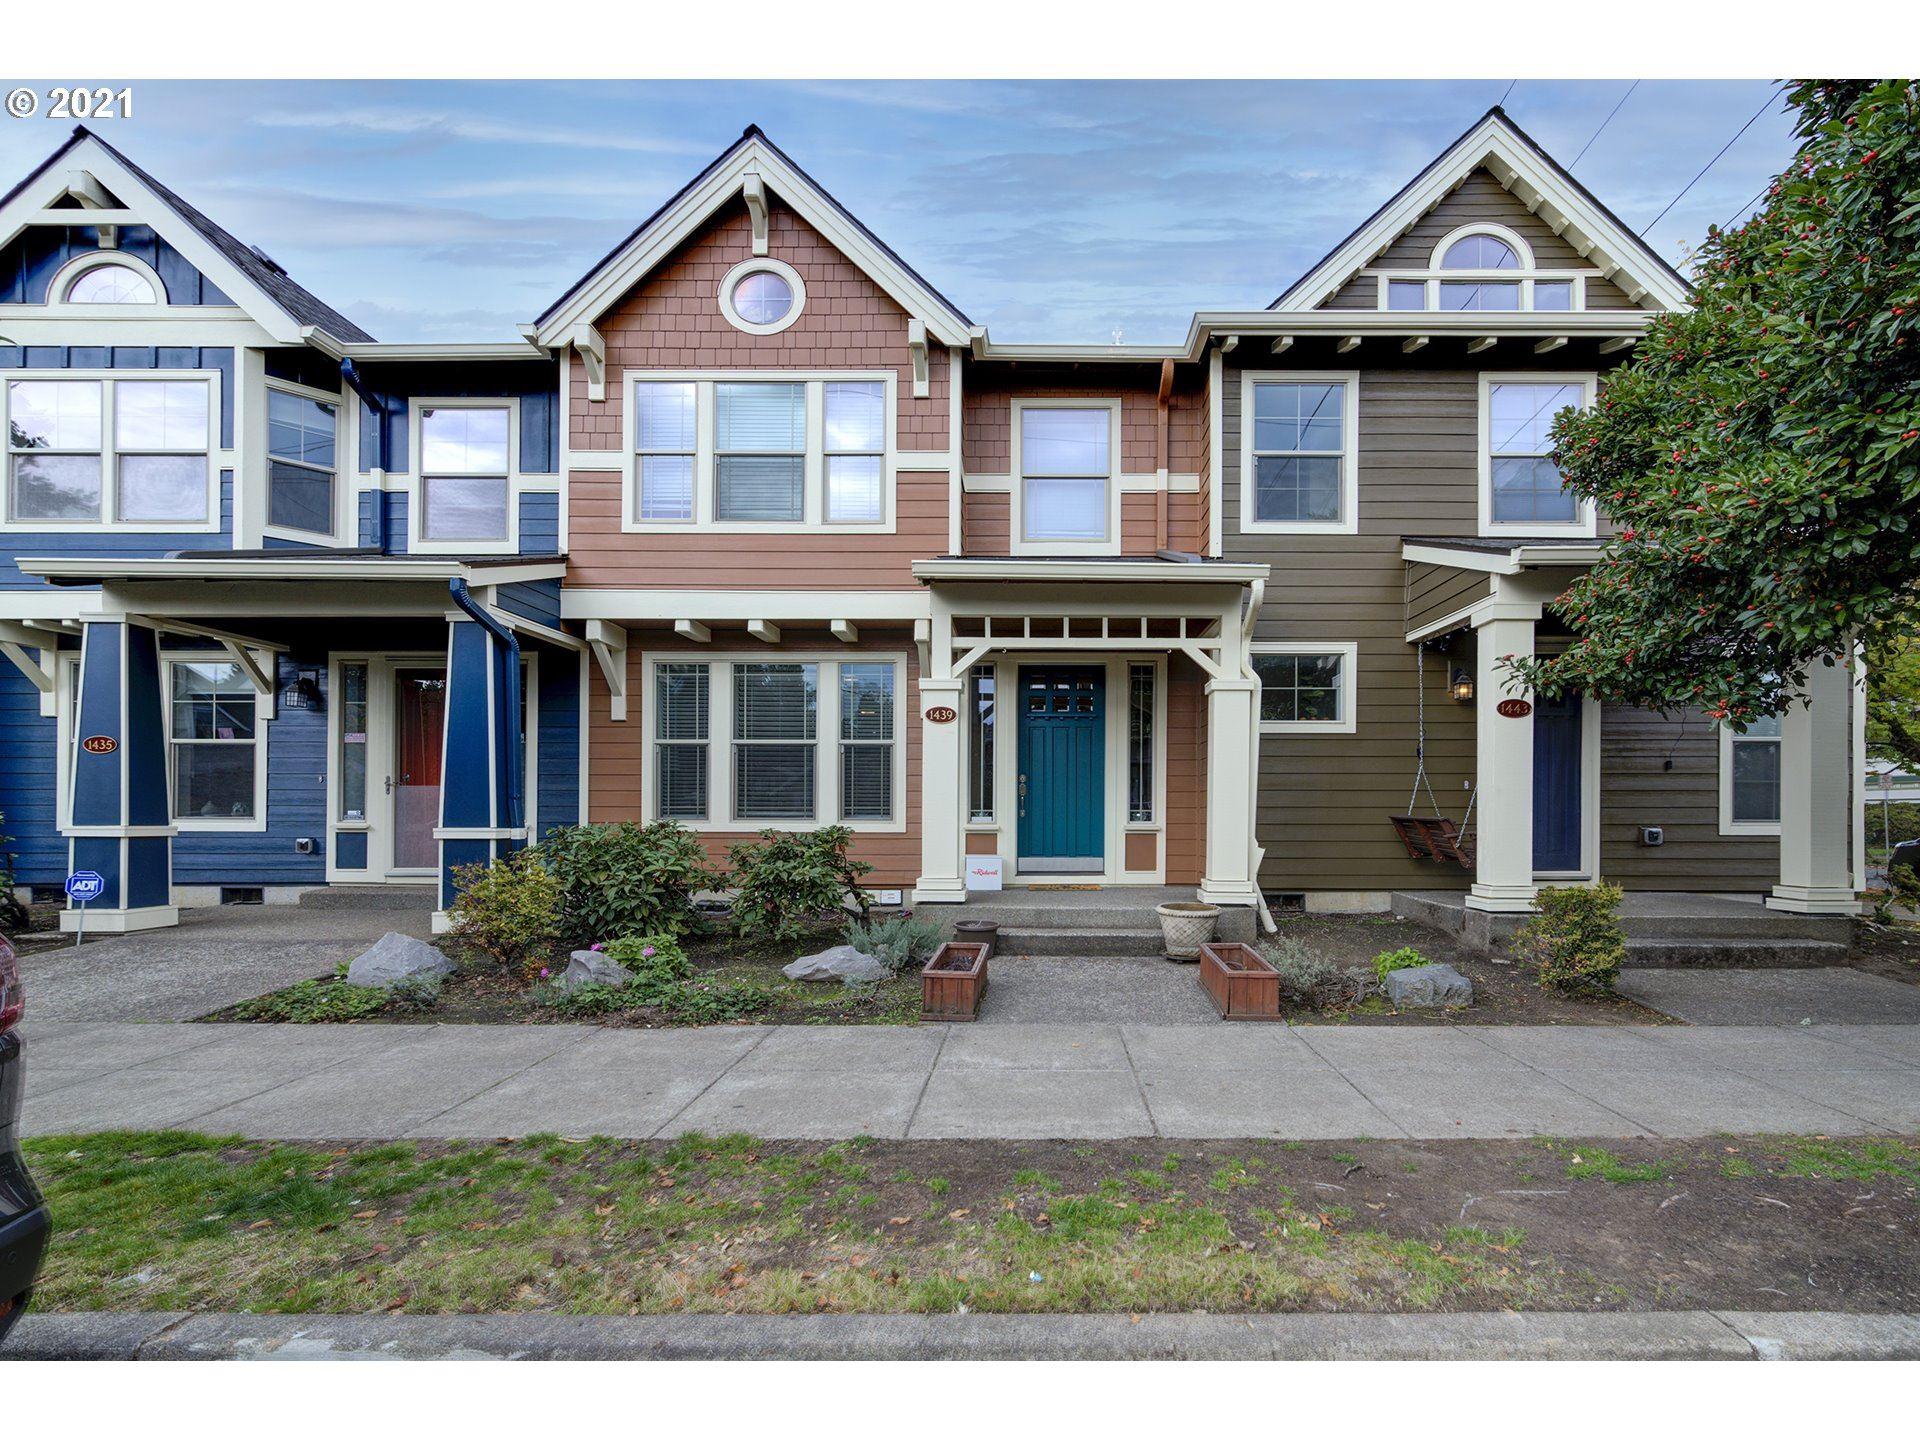 1439 SE HARNEY ST, Portland, OR 97202 - MLS#: 21519952